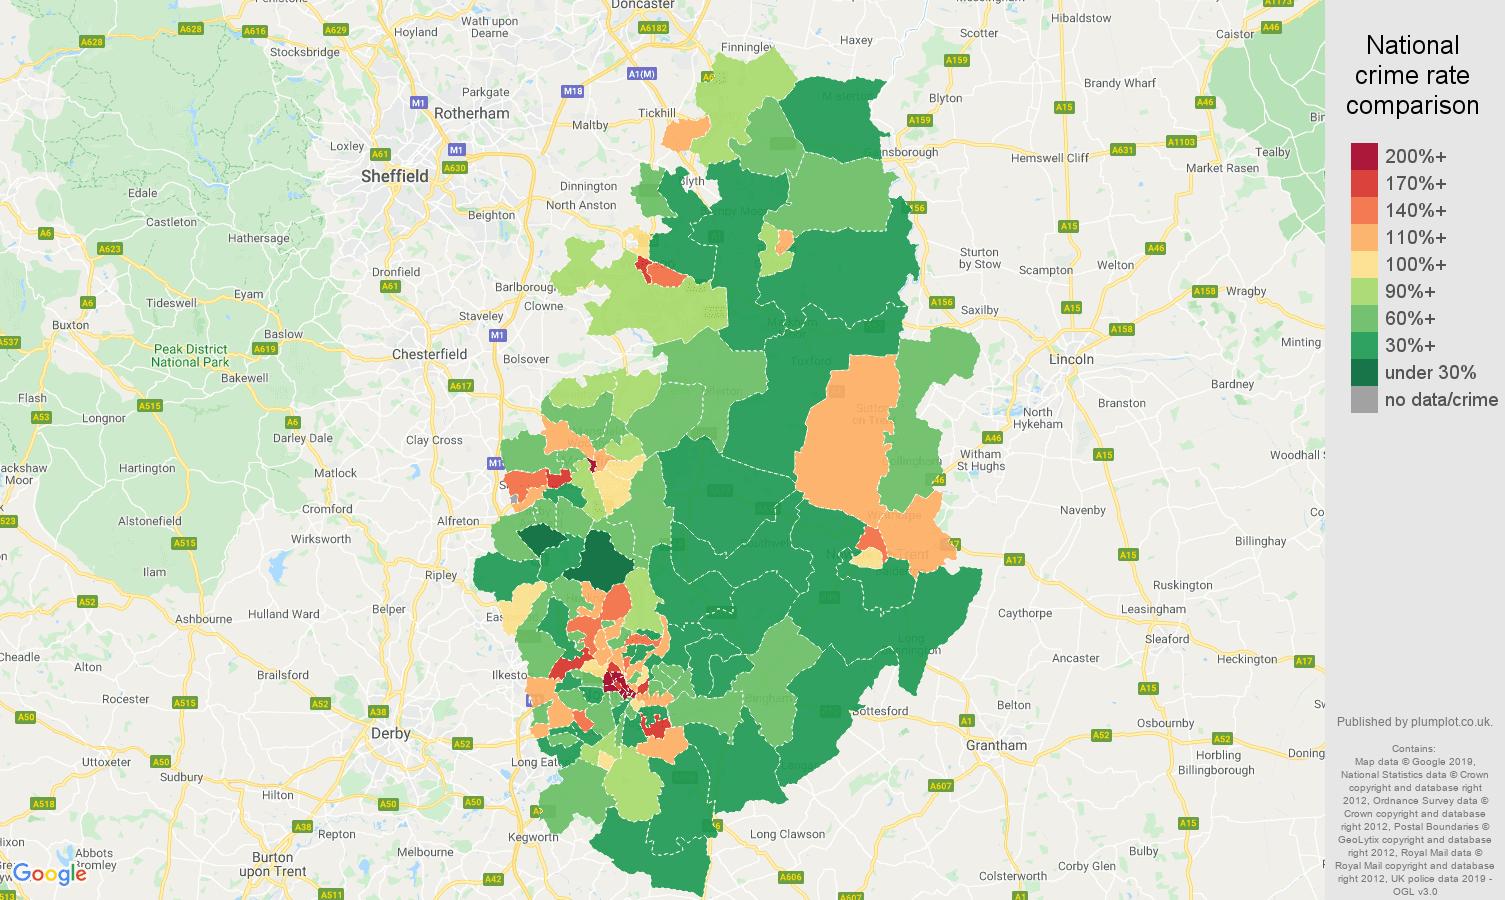 Nottinghamshire other theft crime rate comparison map